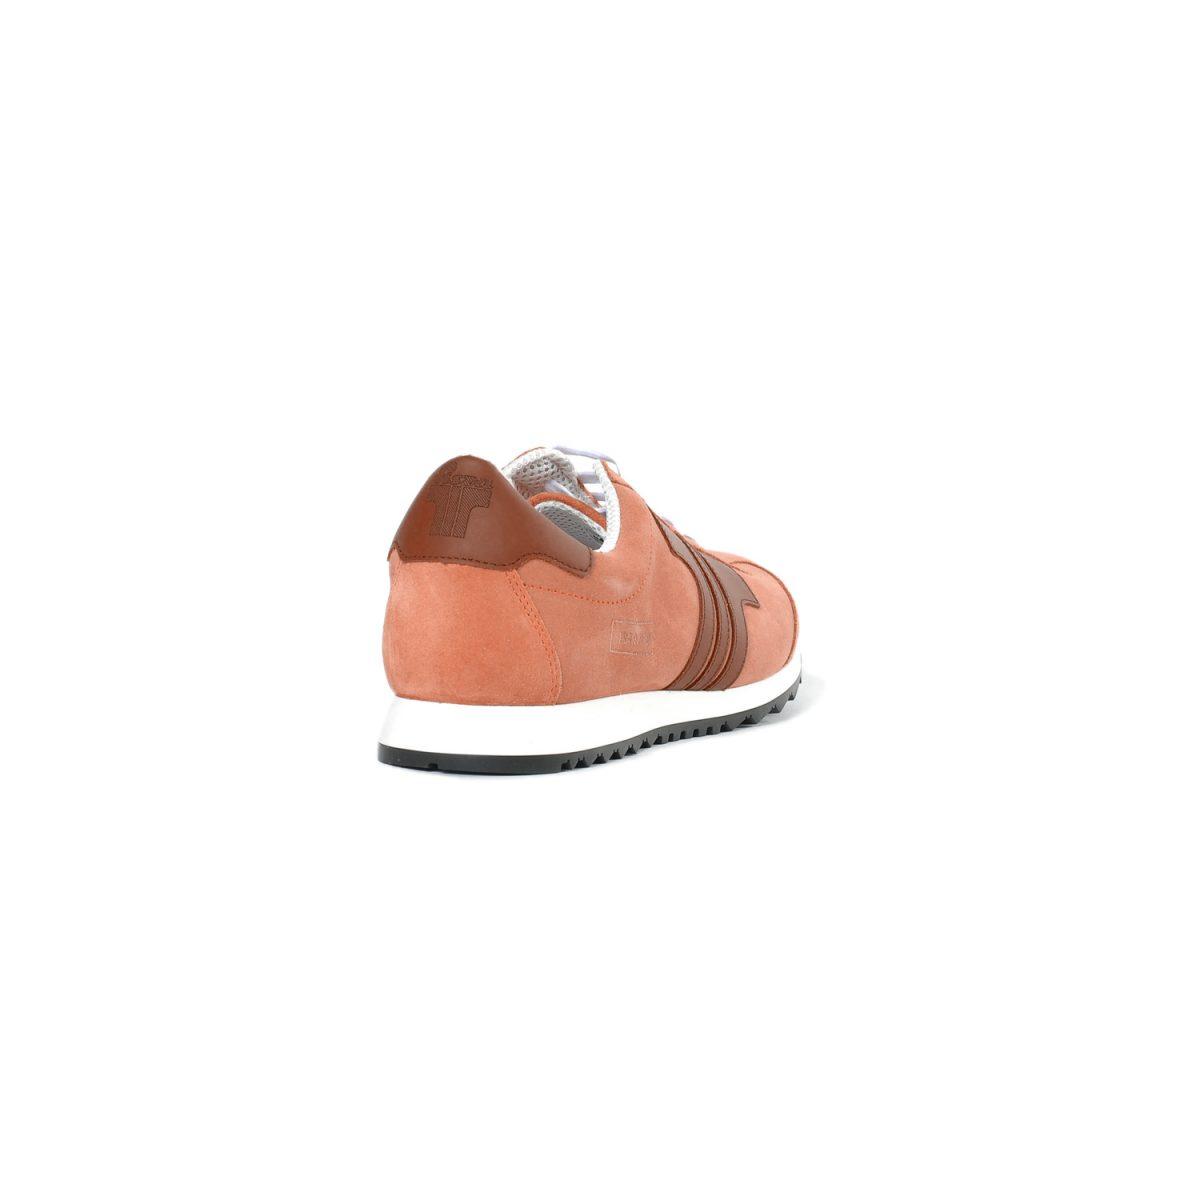 Tisza cipő - Martfű - Nyers-bronzbarna